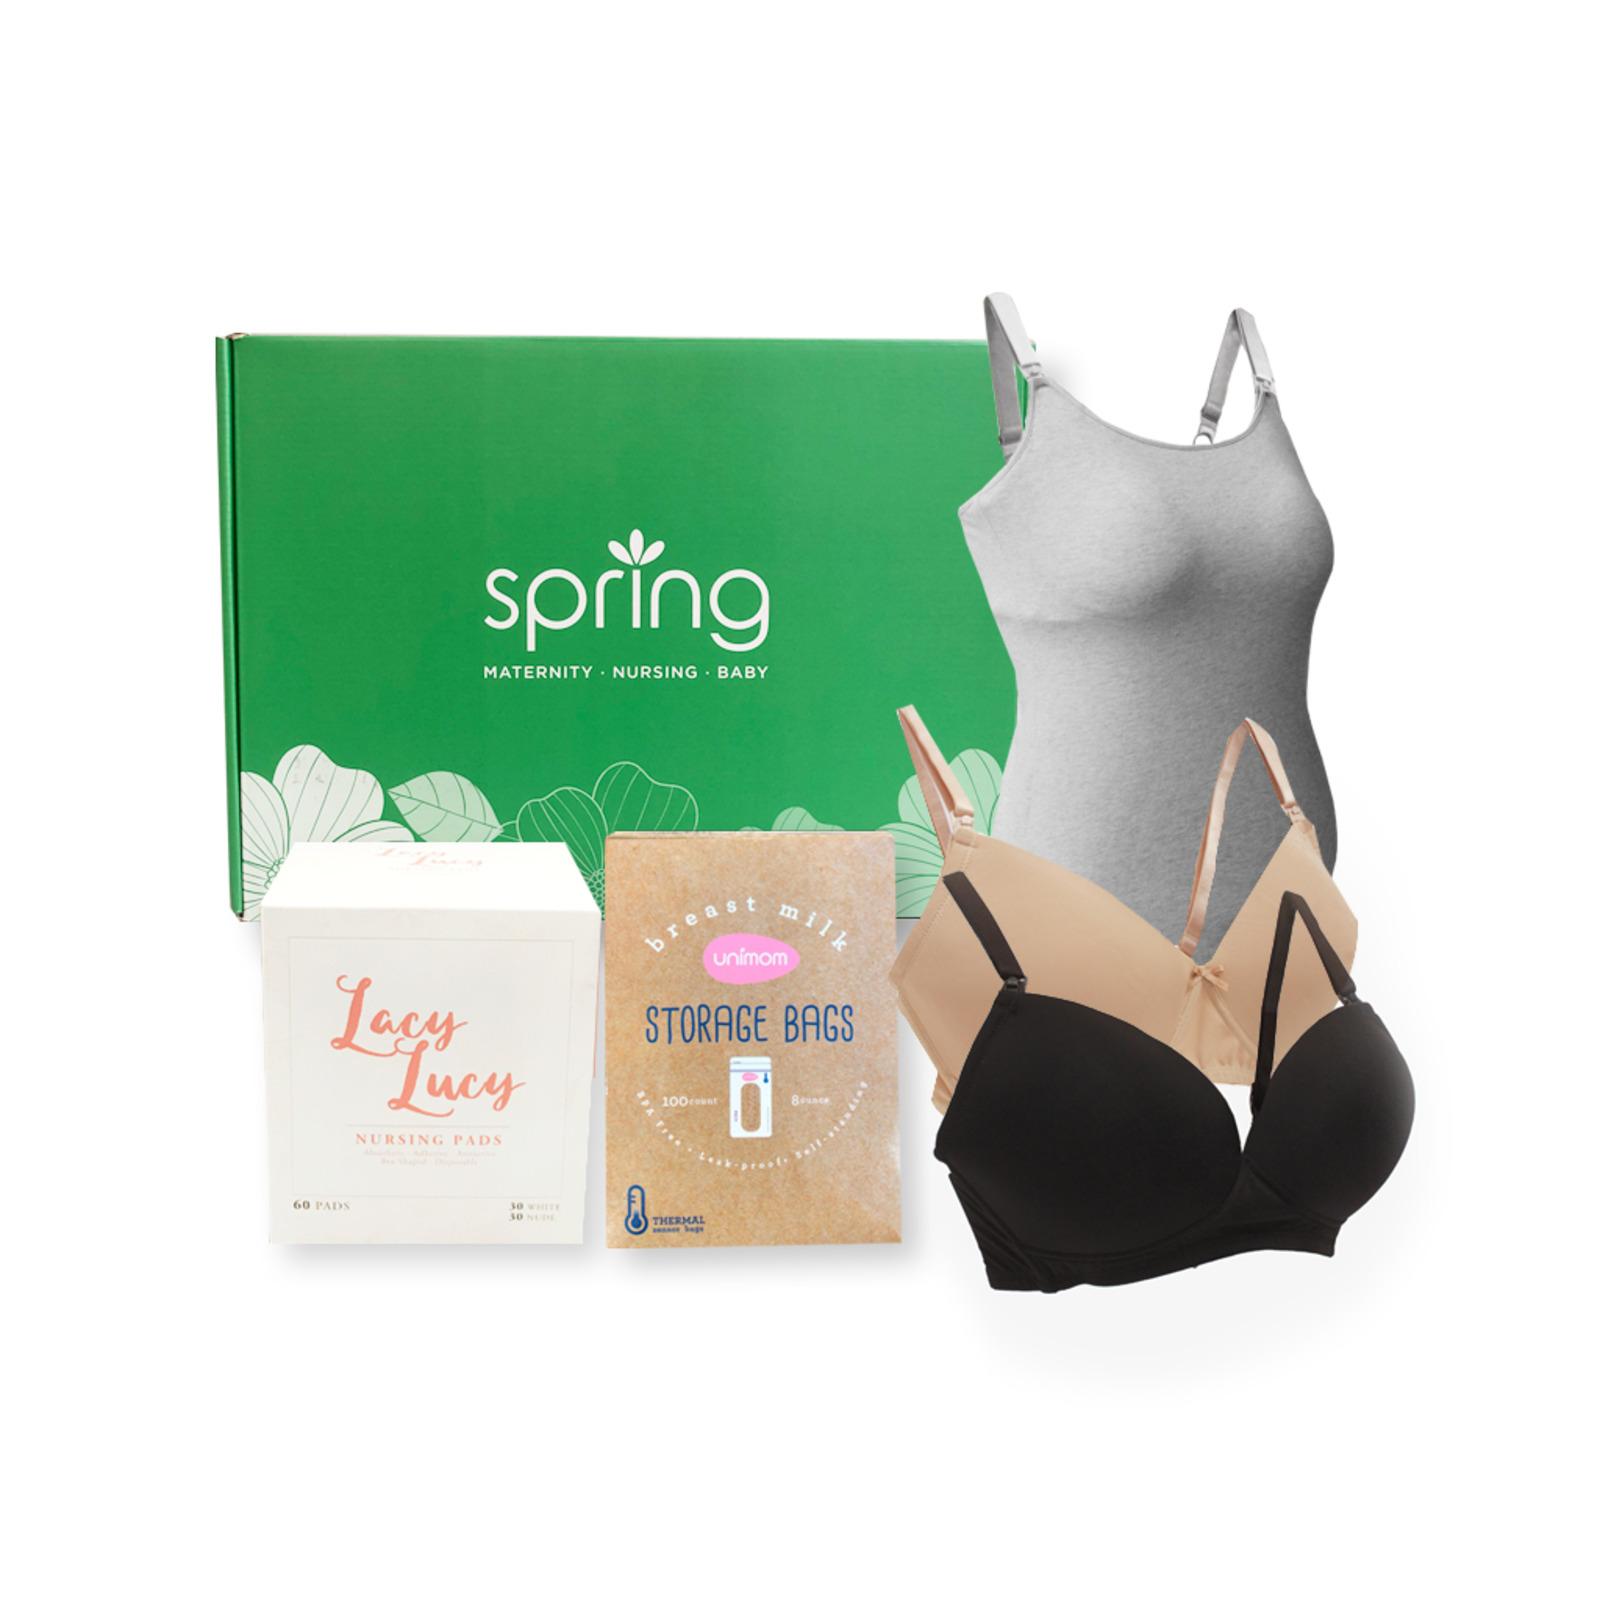 Spring Maternity Nursing Care Pack - Size S